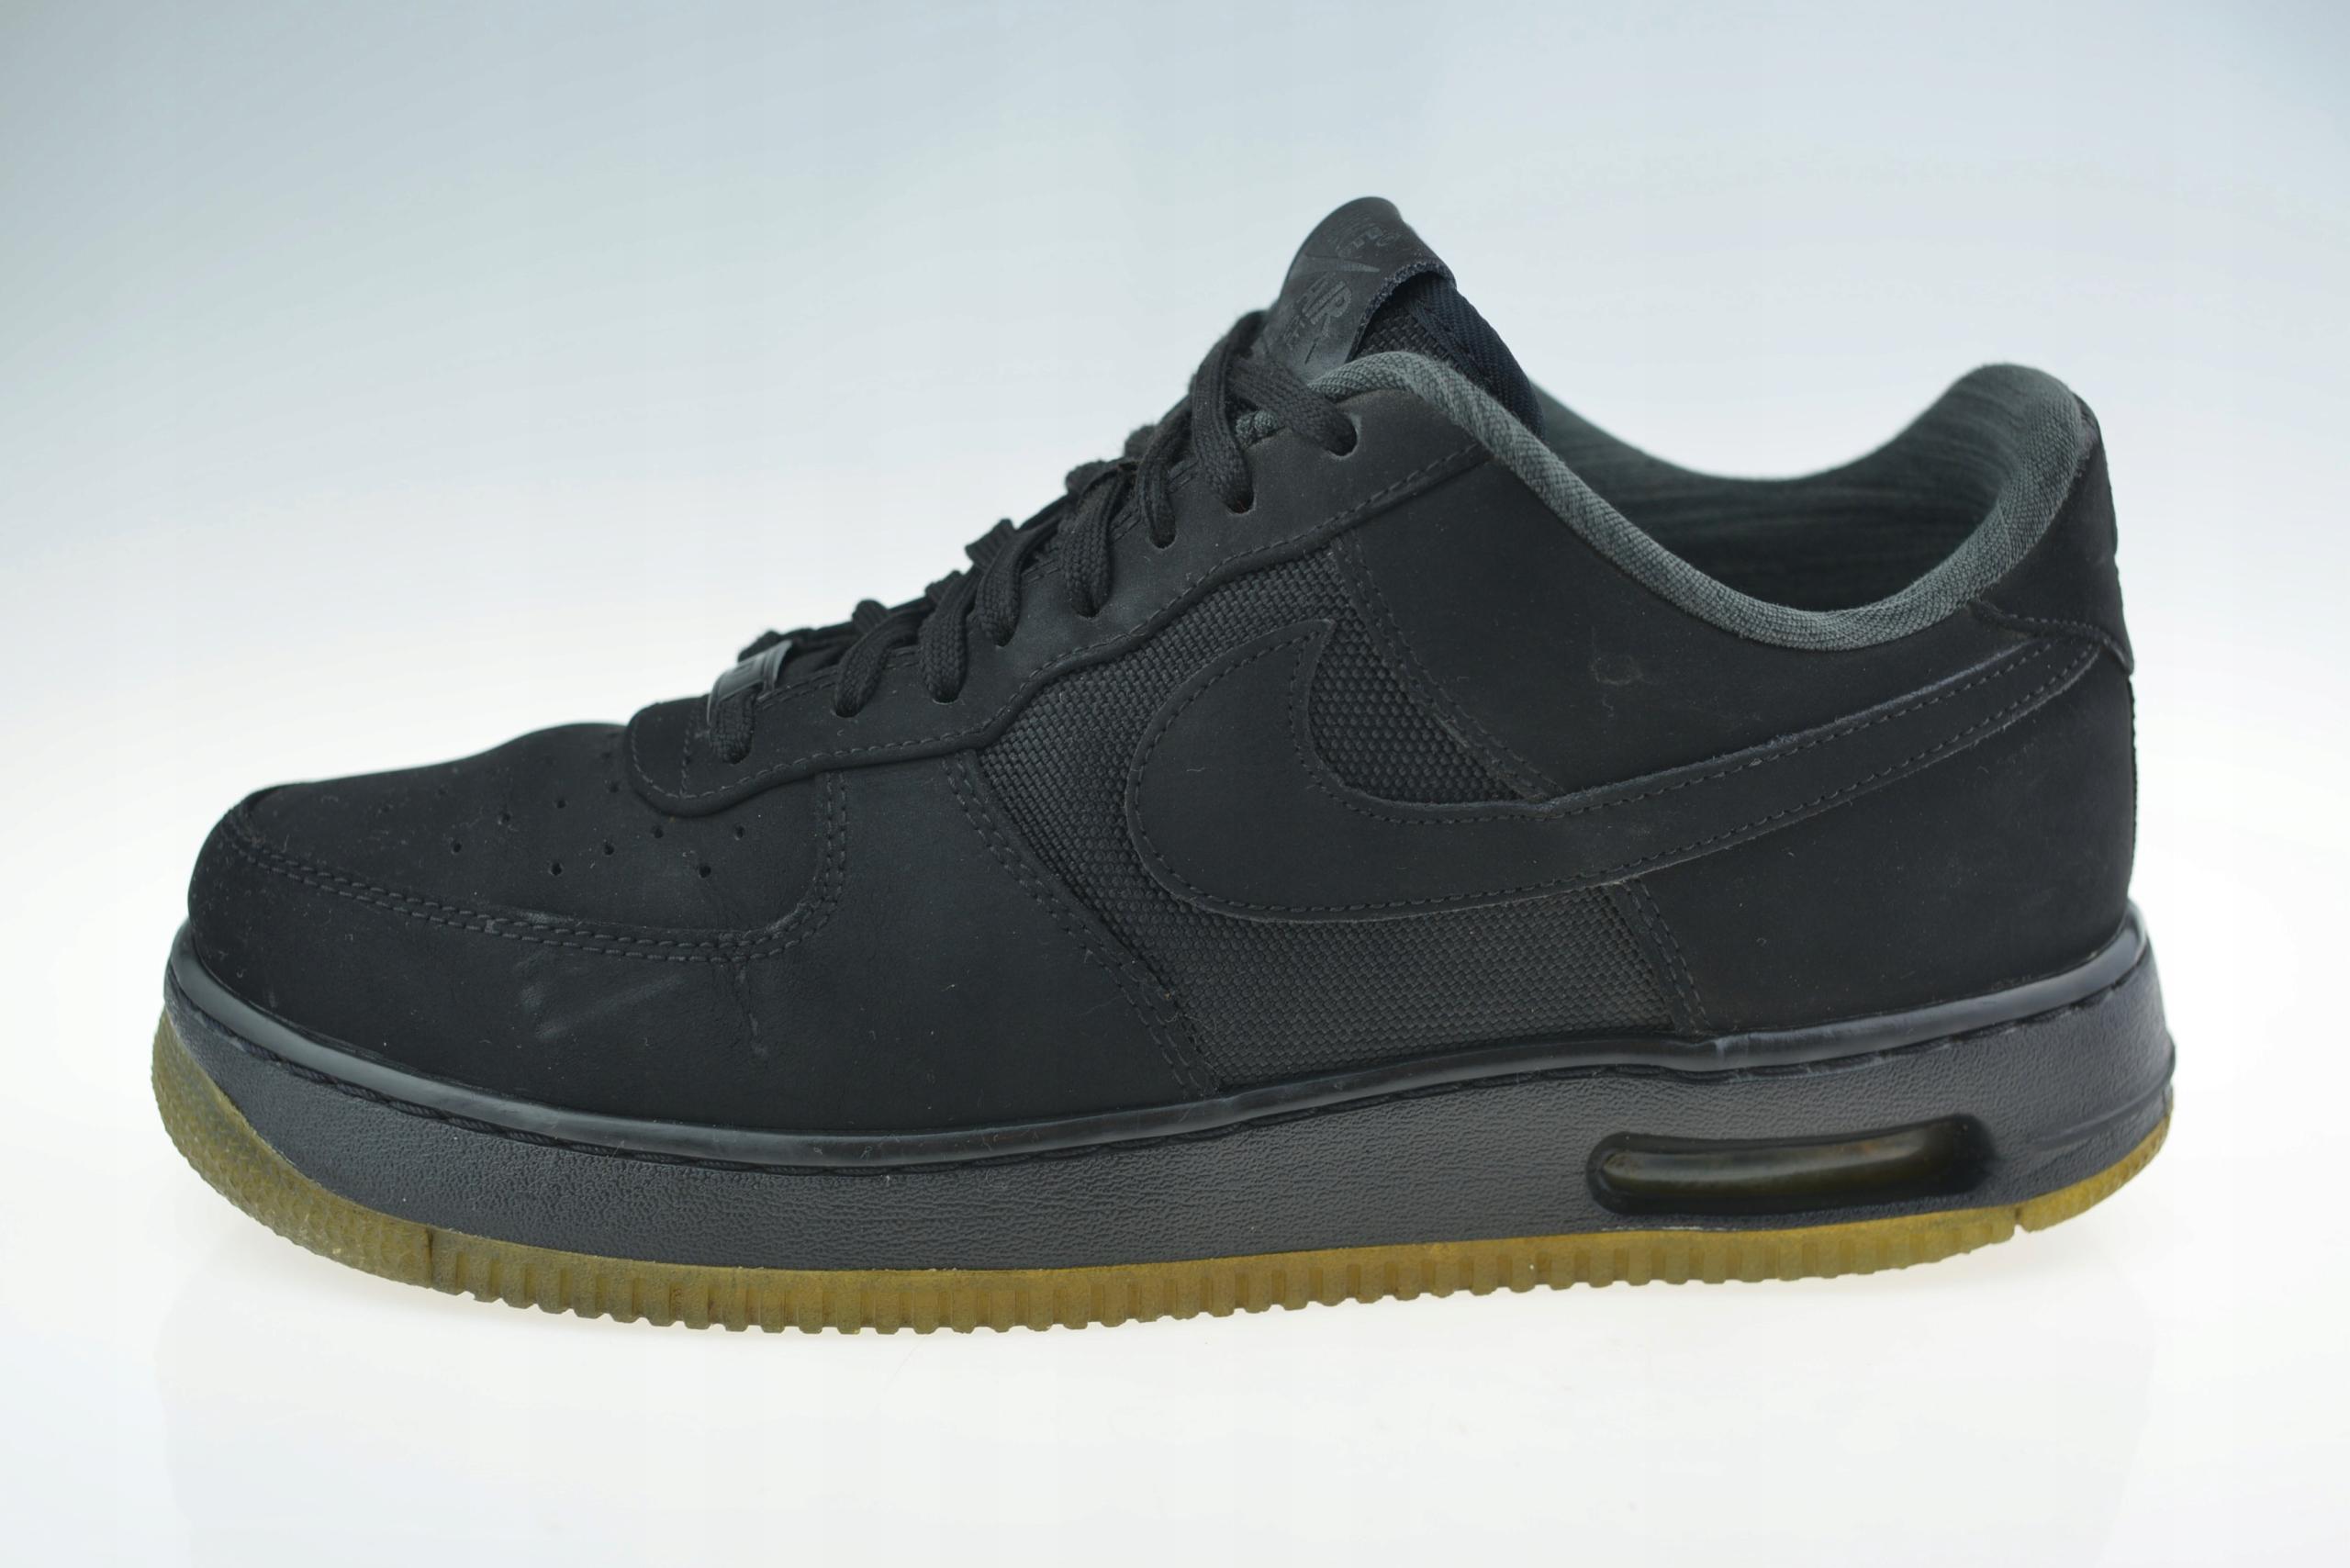 Nike Buty męskie Air Force 1 '07 LV8 czarne r. 40 (BV1278 001)